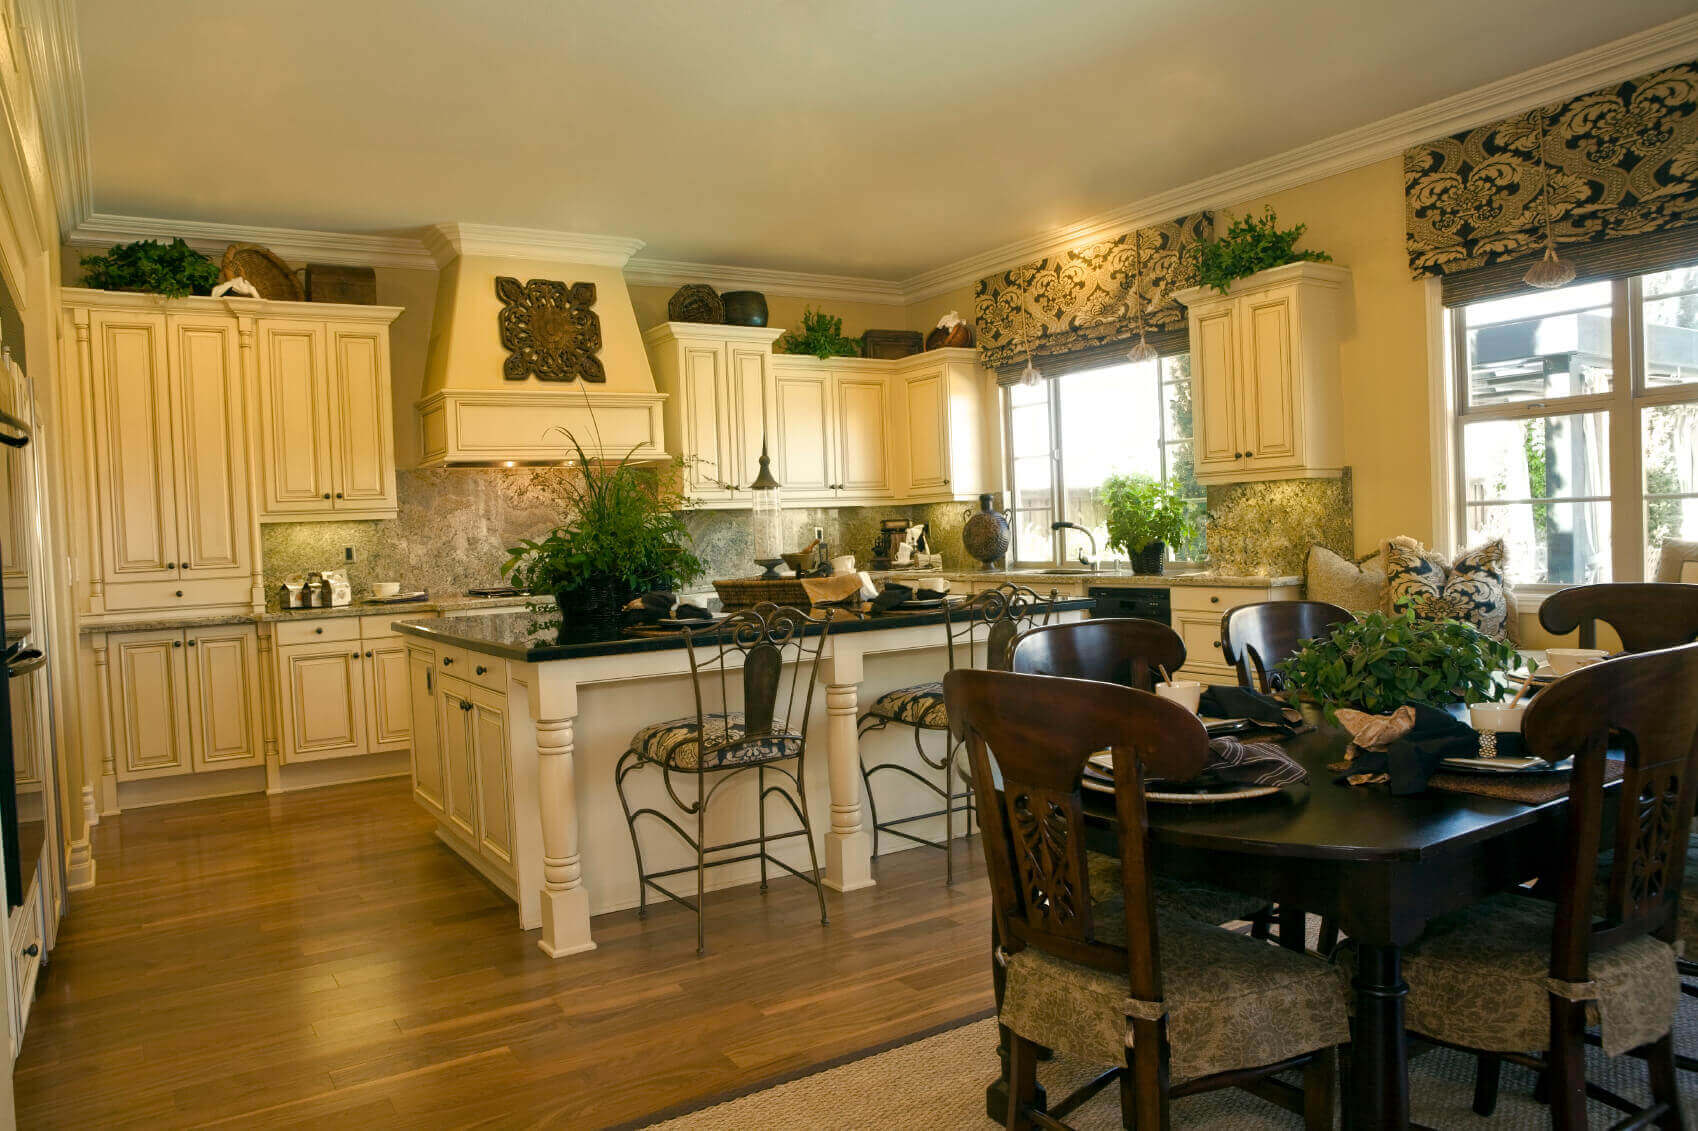 89 contemporary kitchen design ideas gallery backsplashes cabinets lights tables islands. Black Bedroom Furniture Sets. Home Design Ideas